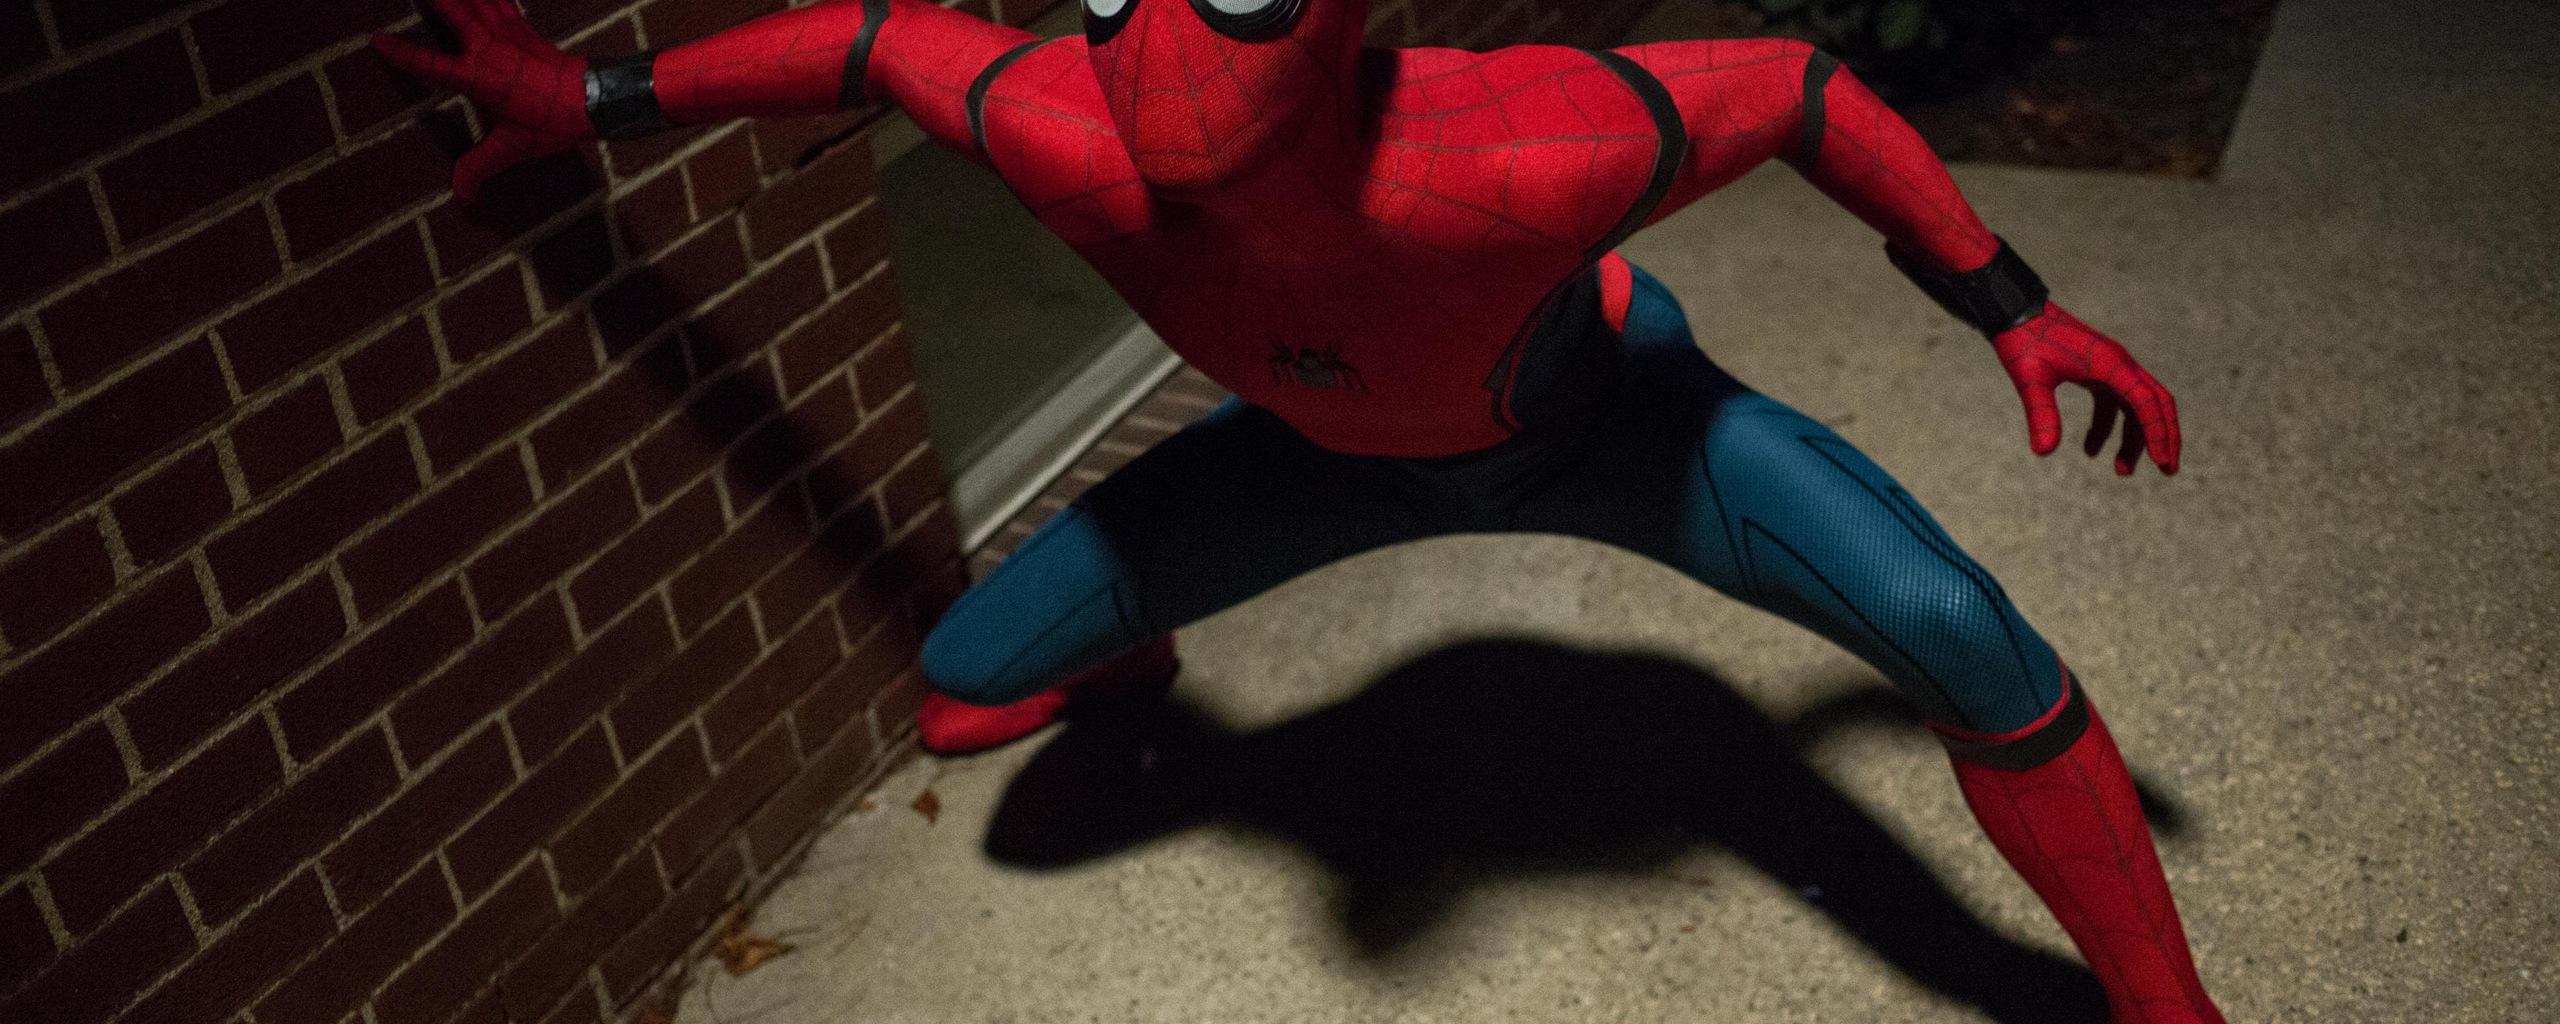 spiderman-homecoming-still-yq.jpg